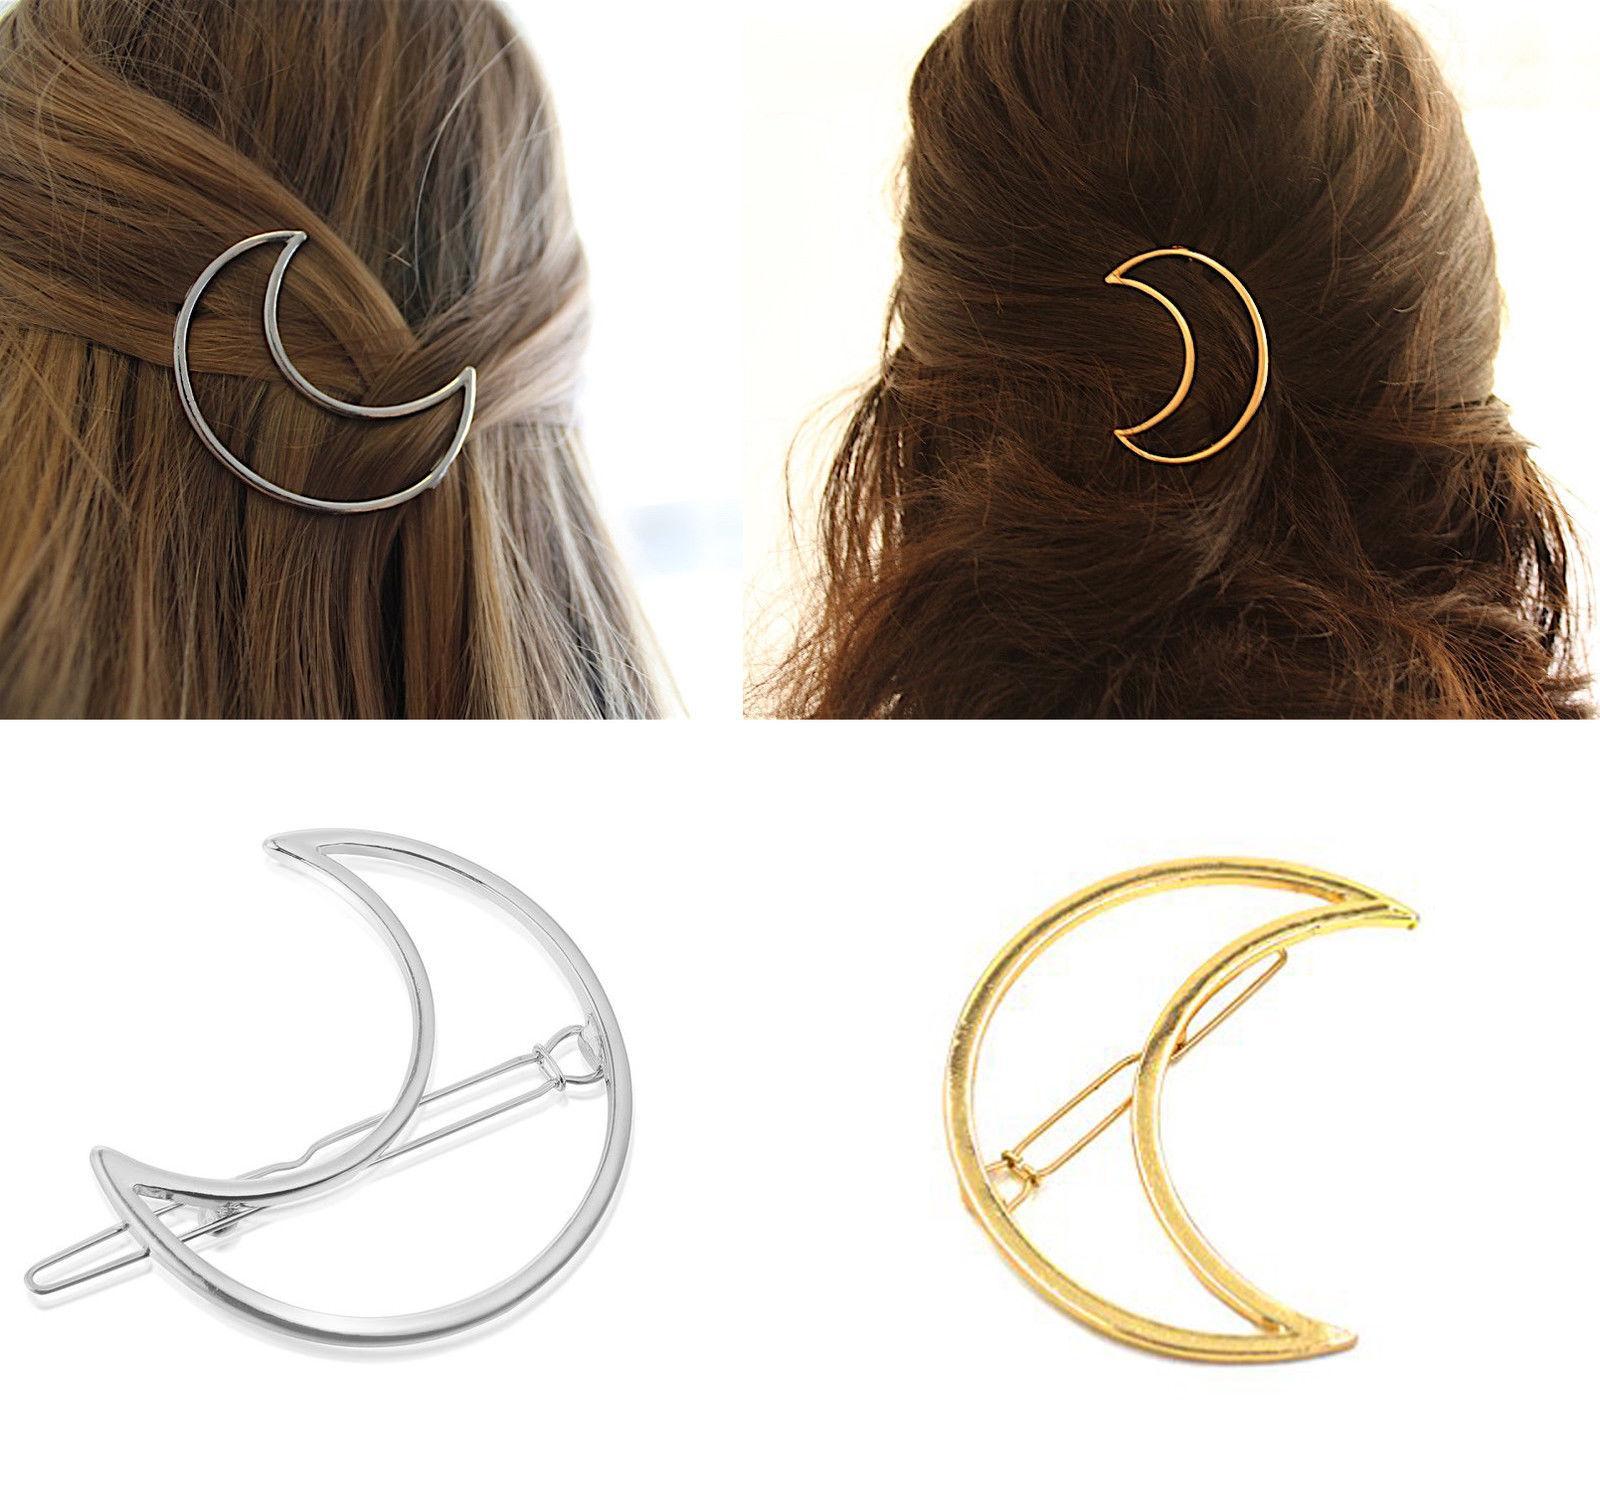 crescent moon goddess hair clip large gold